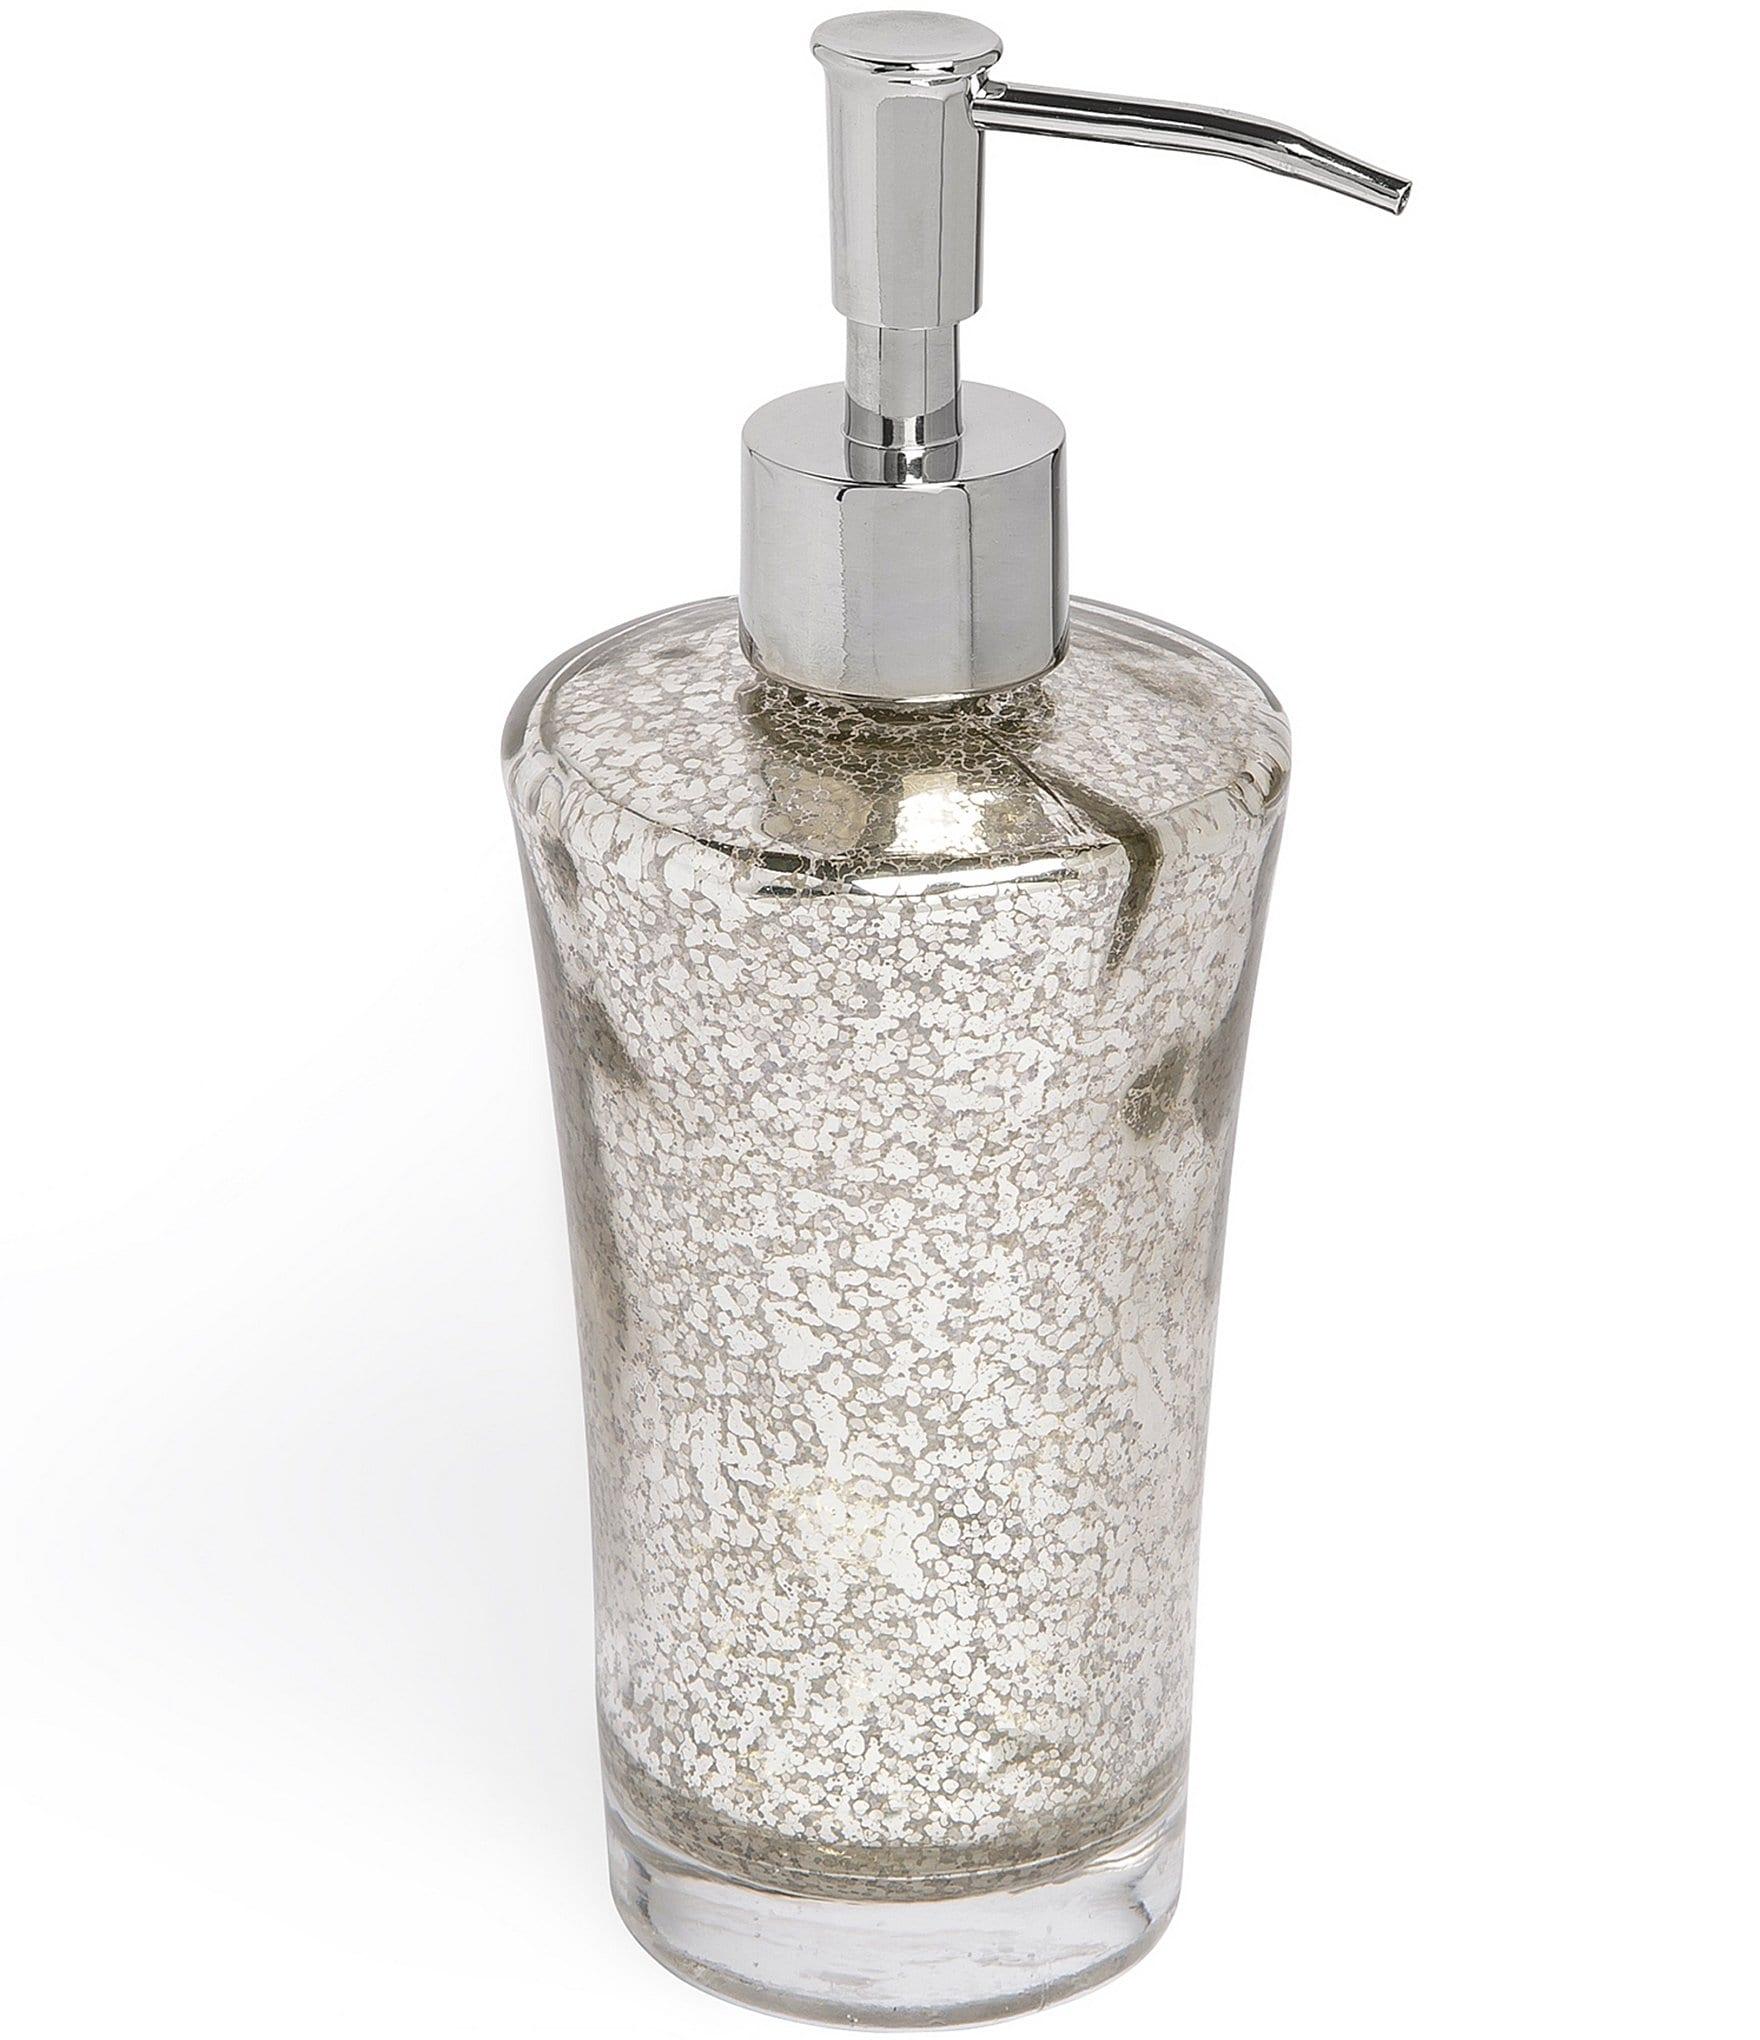 Nicole miller bathroom accessories